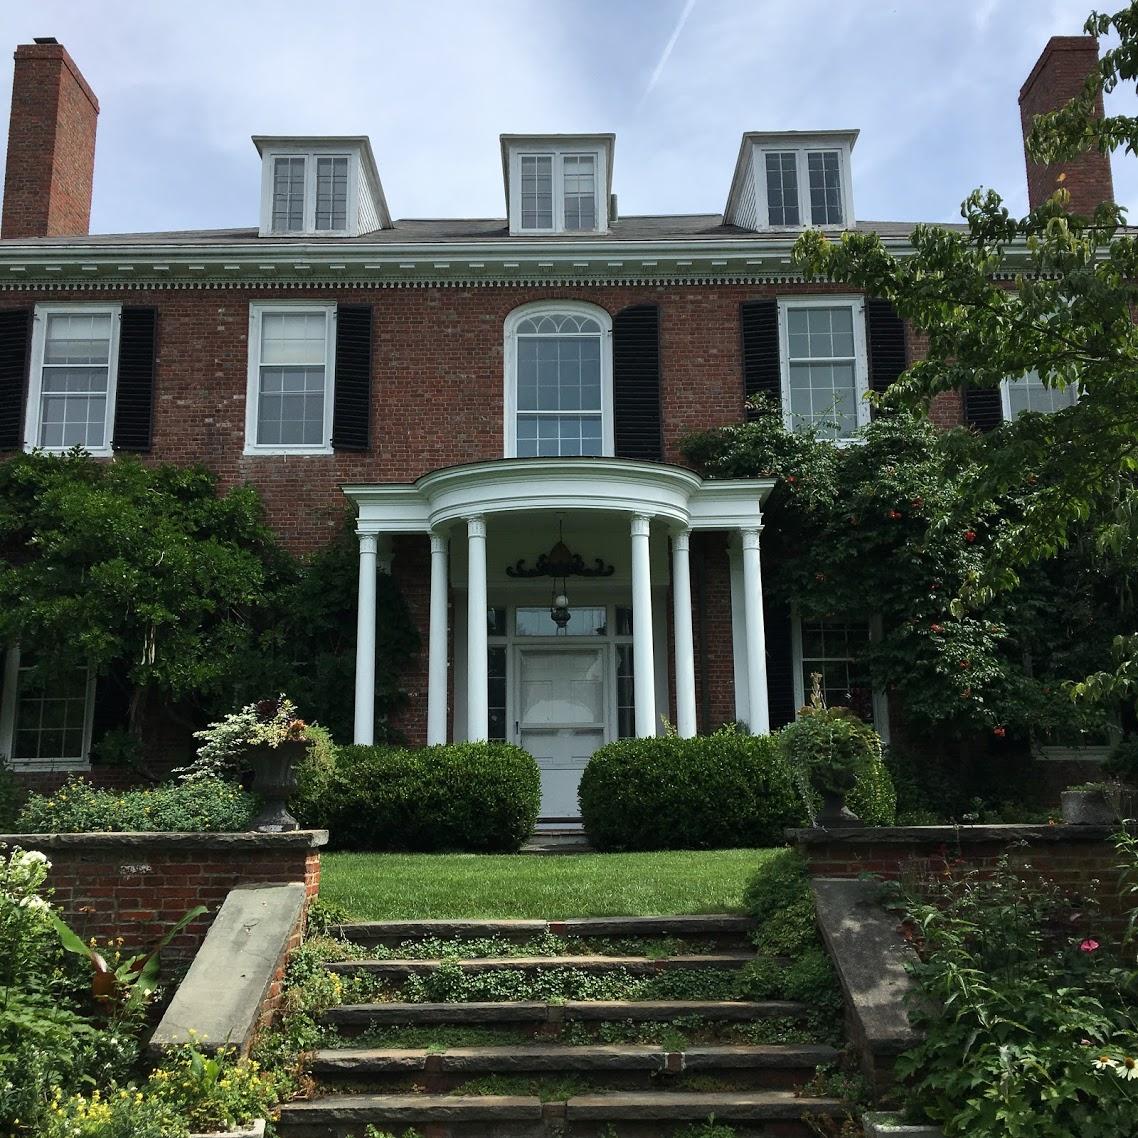 long-hill-house-front.JPG